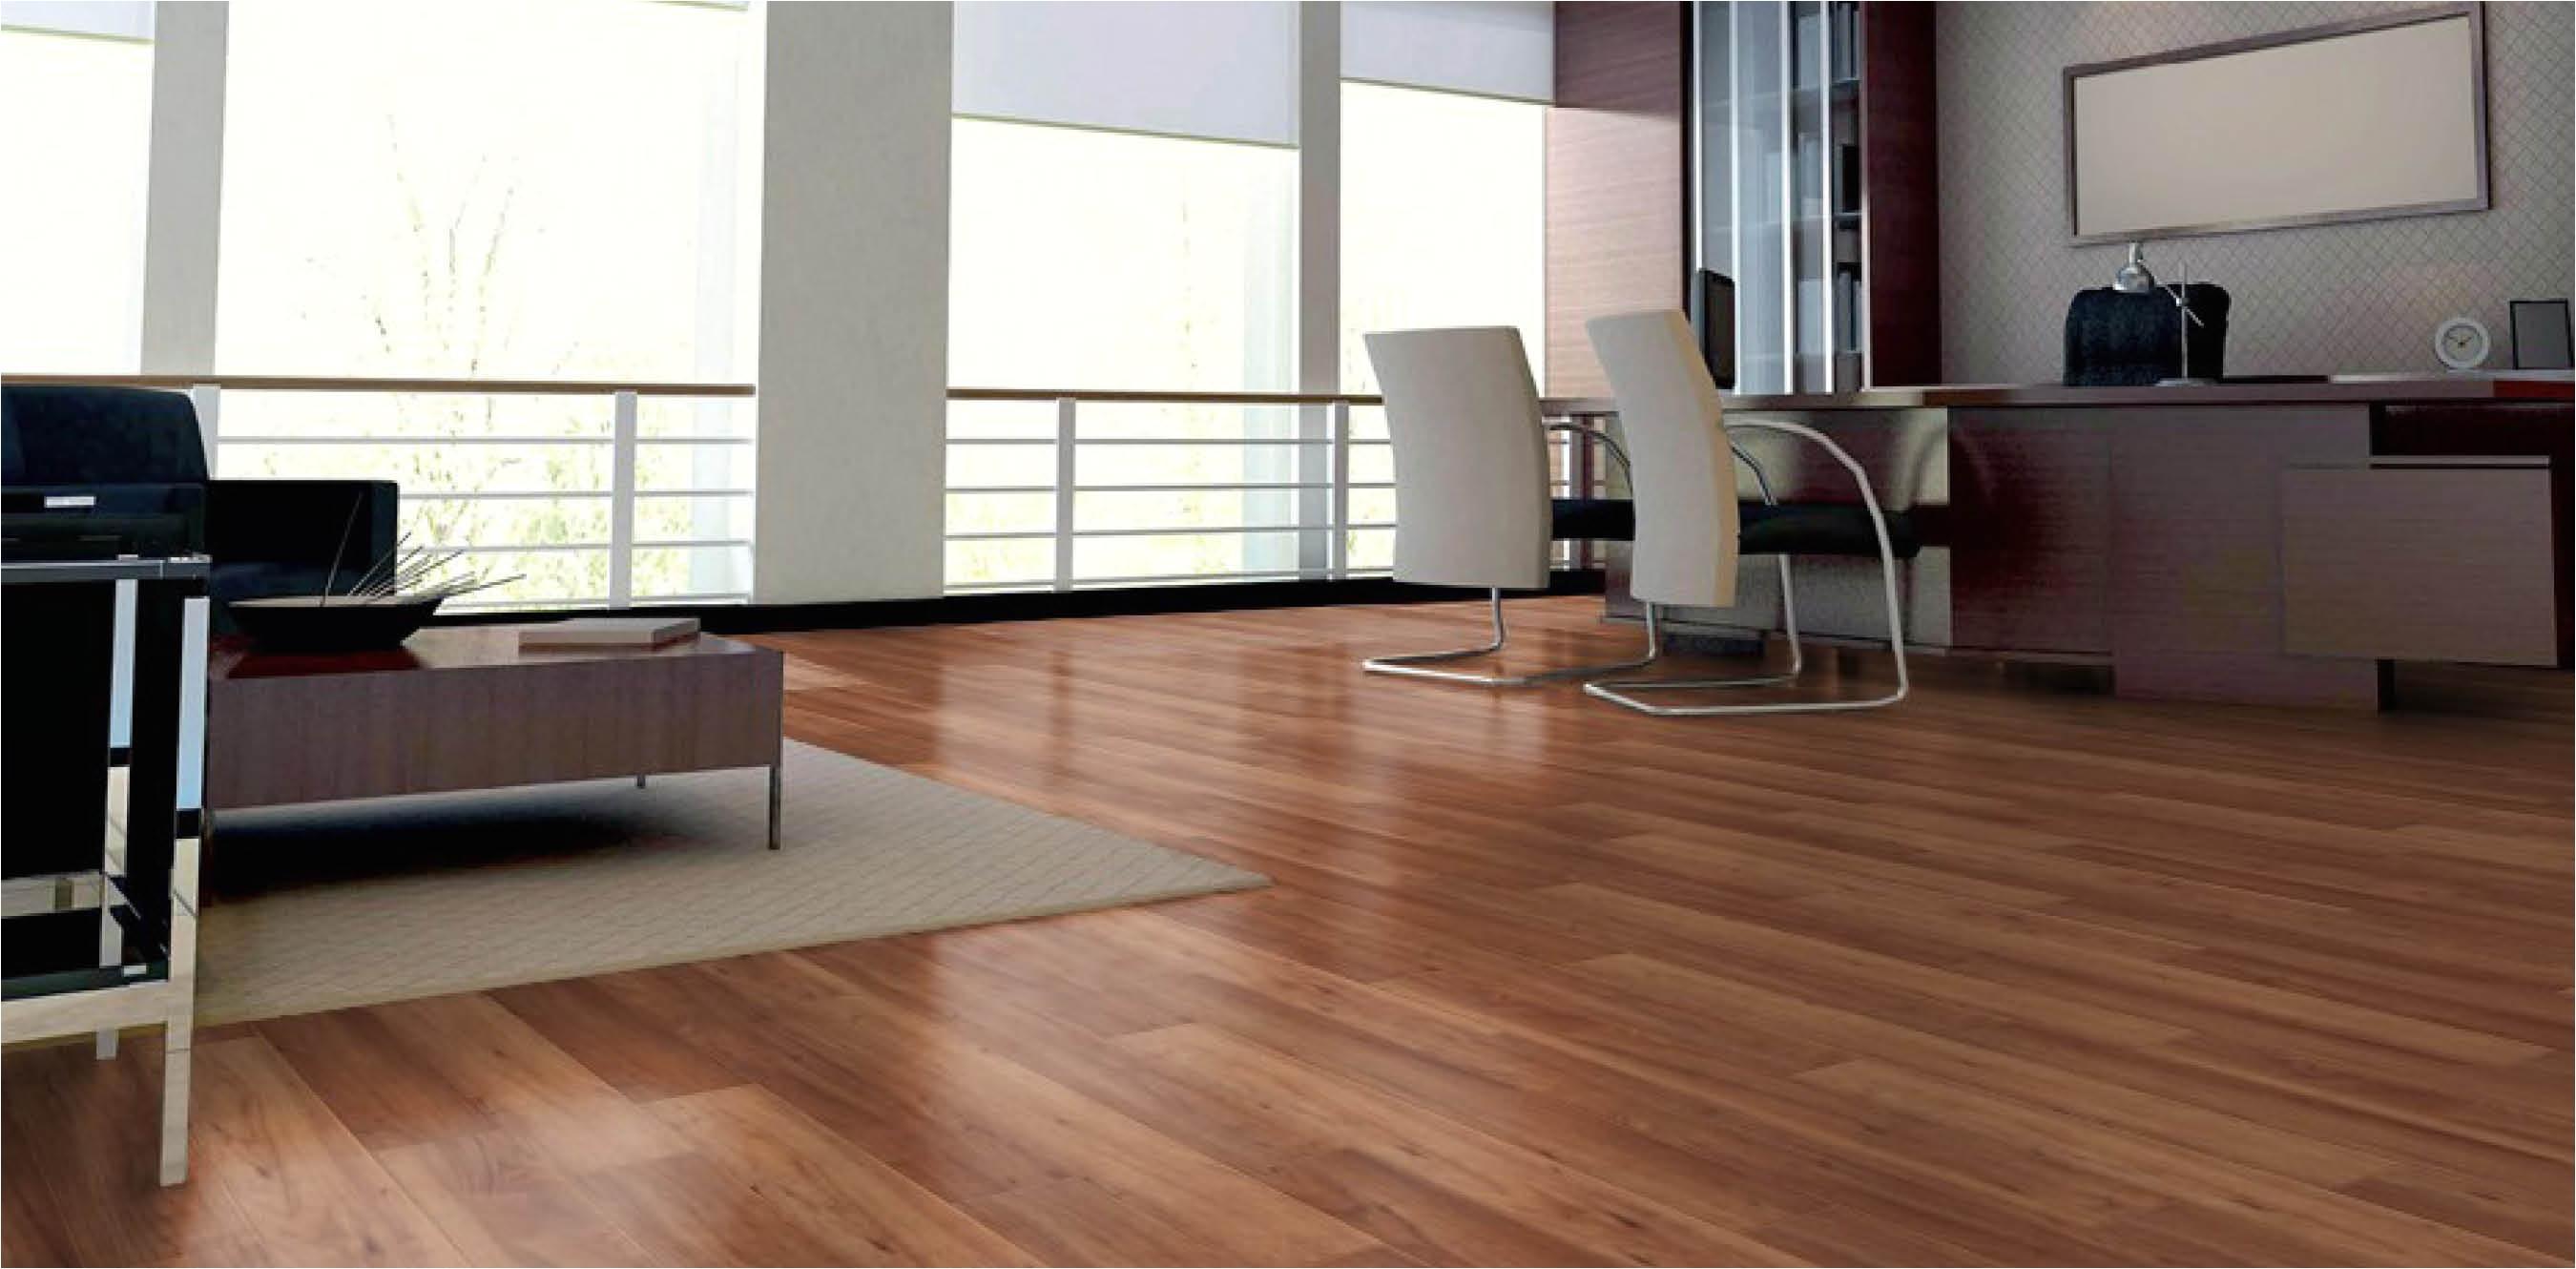 Amtico Teak and Holly Flooring Teak Beautifully Designed Lvt Flooring From the Amtico Signature